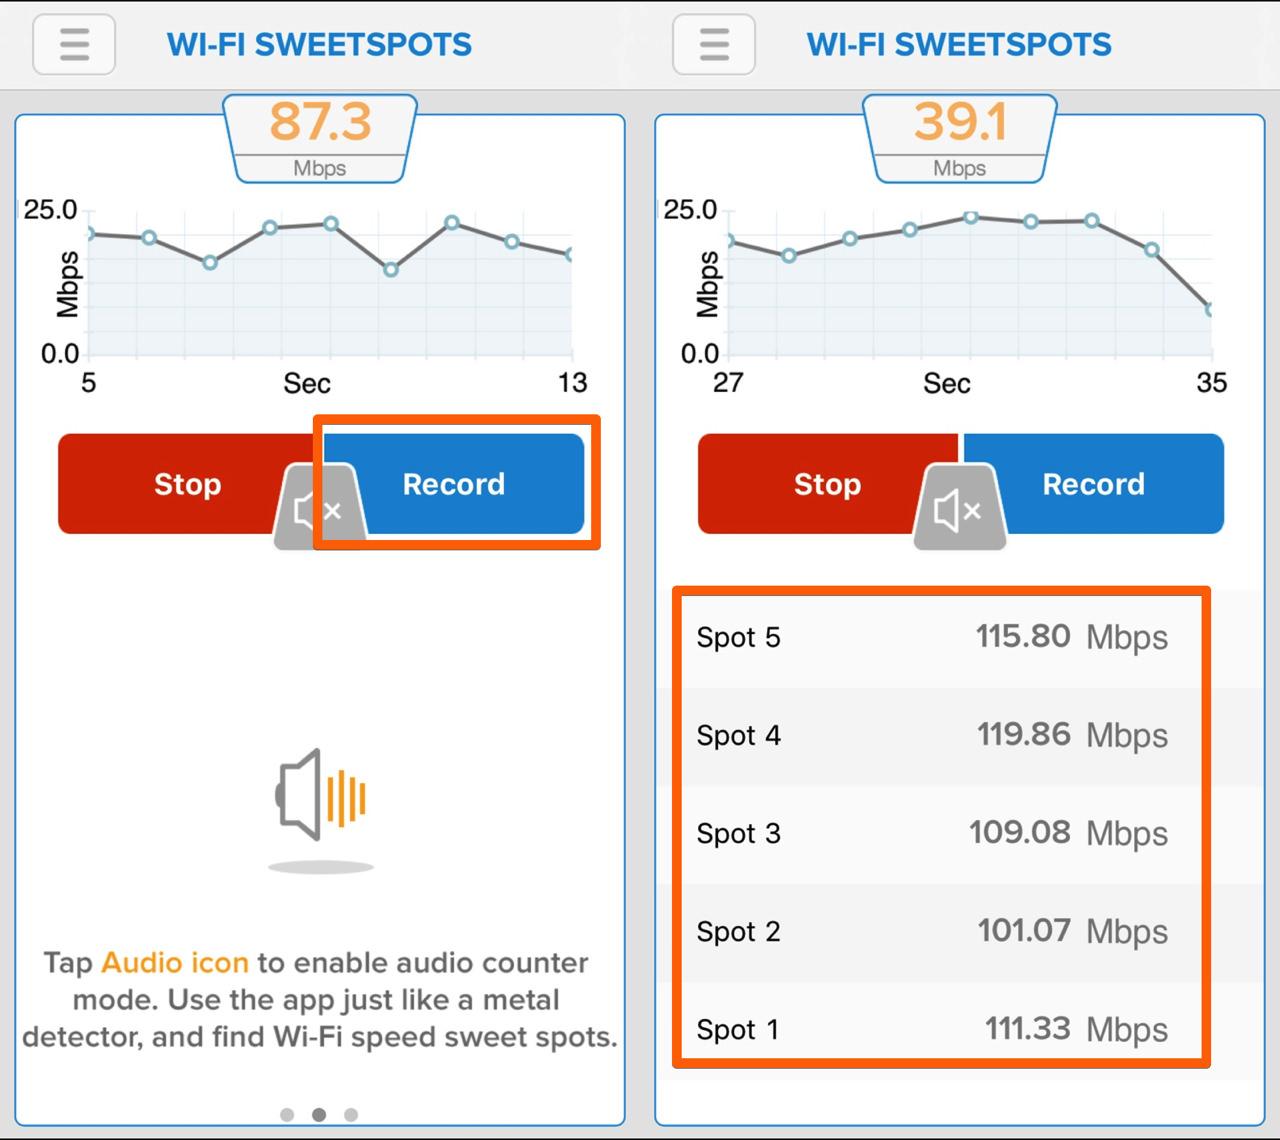 Wifi sweetspots2